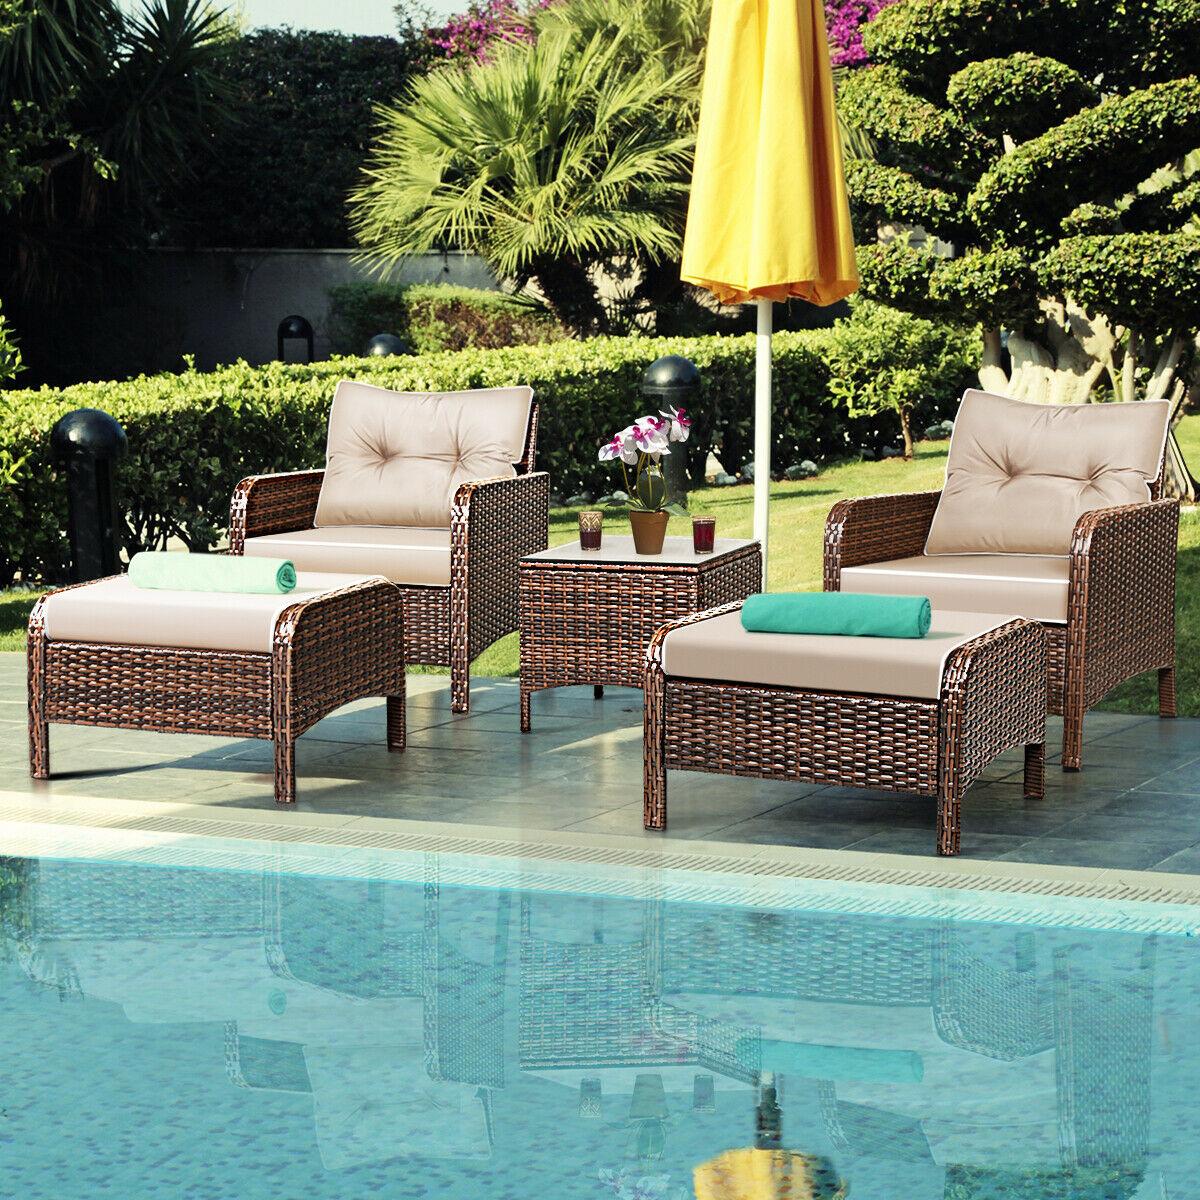 Costway 5 PCS Rattan Wicker Furniture Set Sofa Ottoman W/Brown Cushion Patio Garden Yard